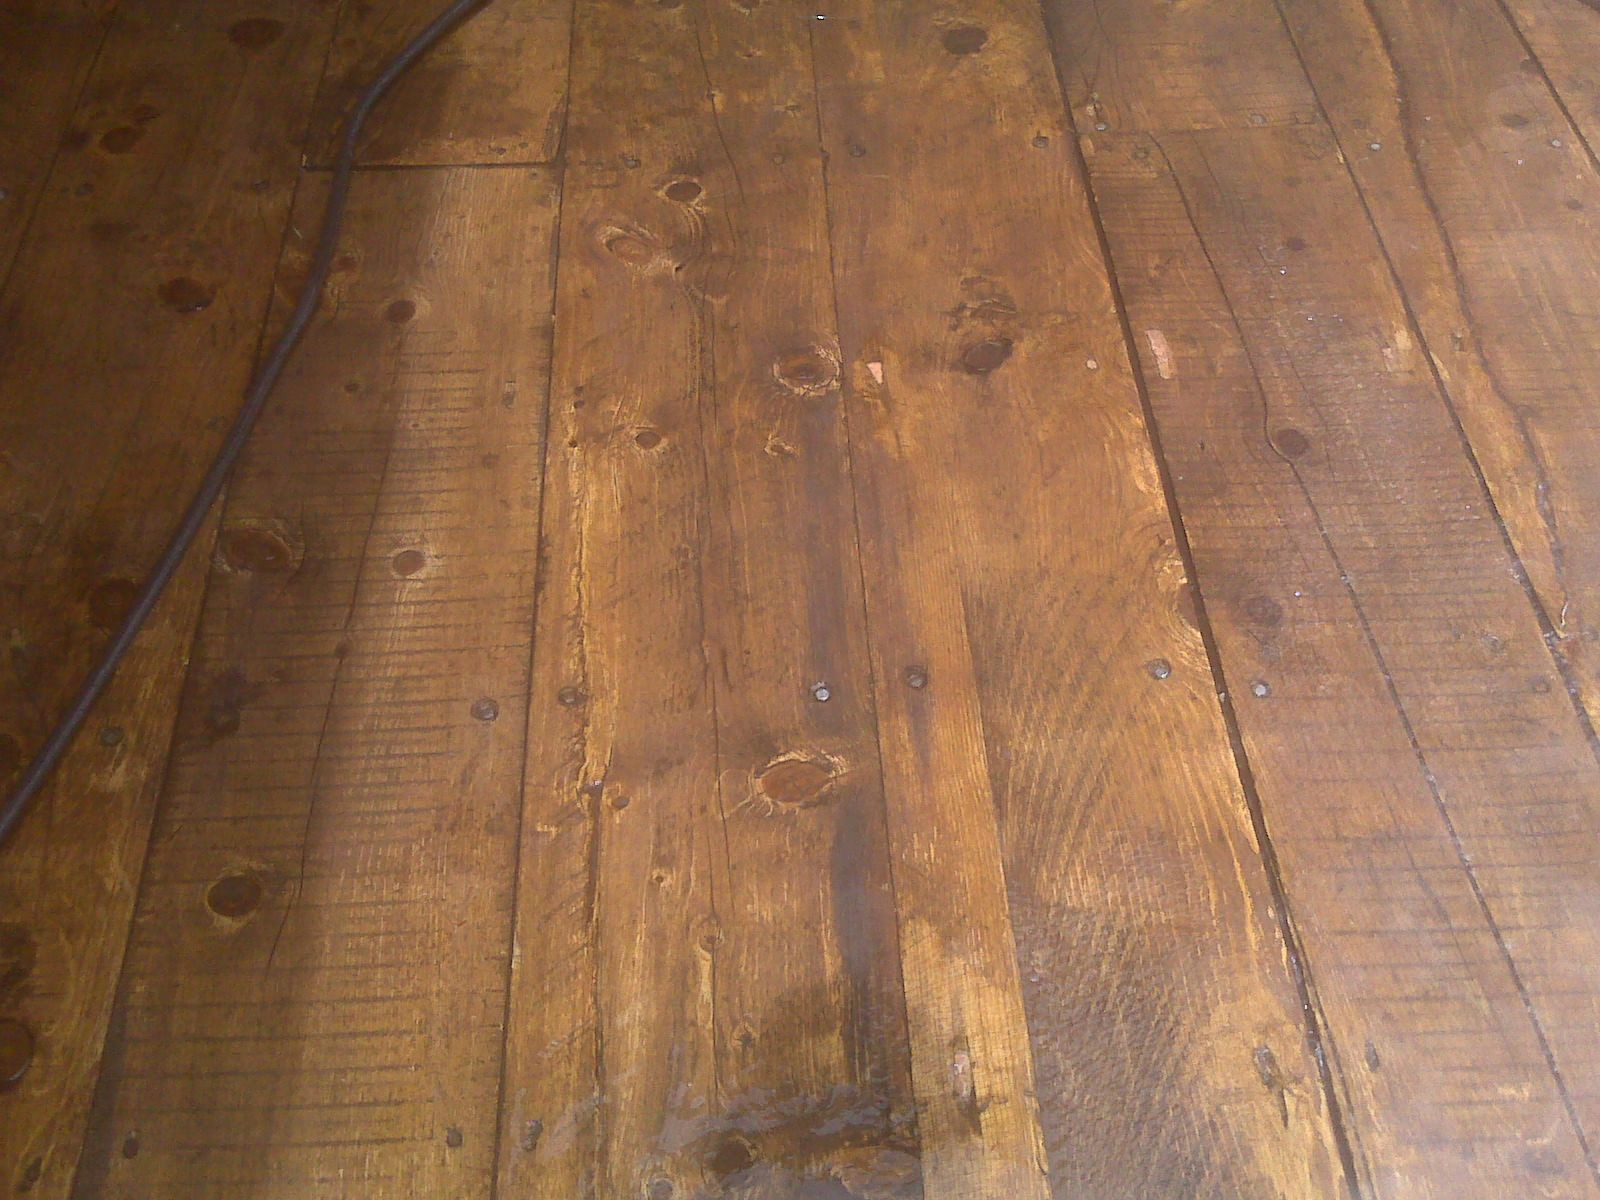 hardwood floor refinishing bellingham wa of sikkens dark oak deck stain we use sikkens products on bellingham for sikkens dark oak deck stain we use sikkens products on bellingham wa decks www northpinepainting com